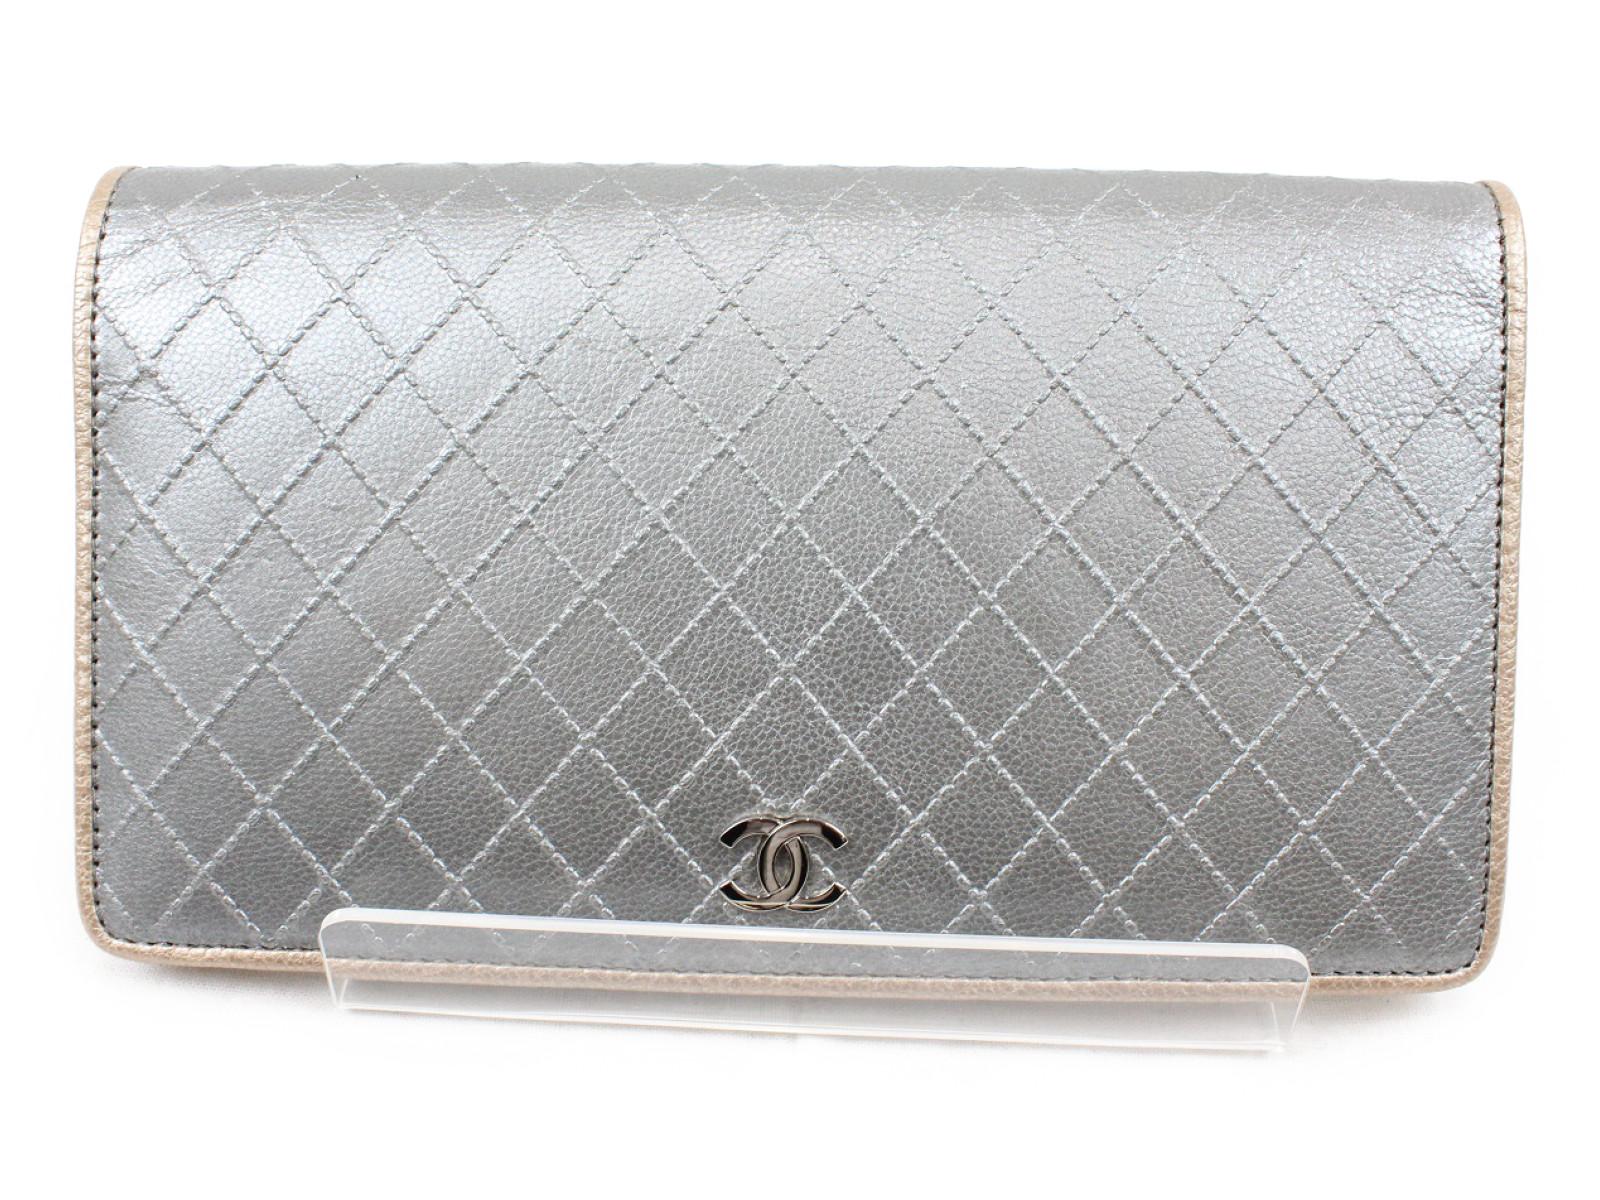 CHANEL シャネルファスナー付き 二つ折り長財布シルバー A33911 【中古】